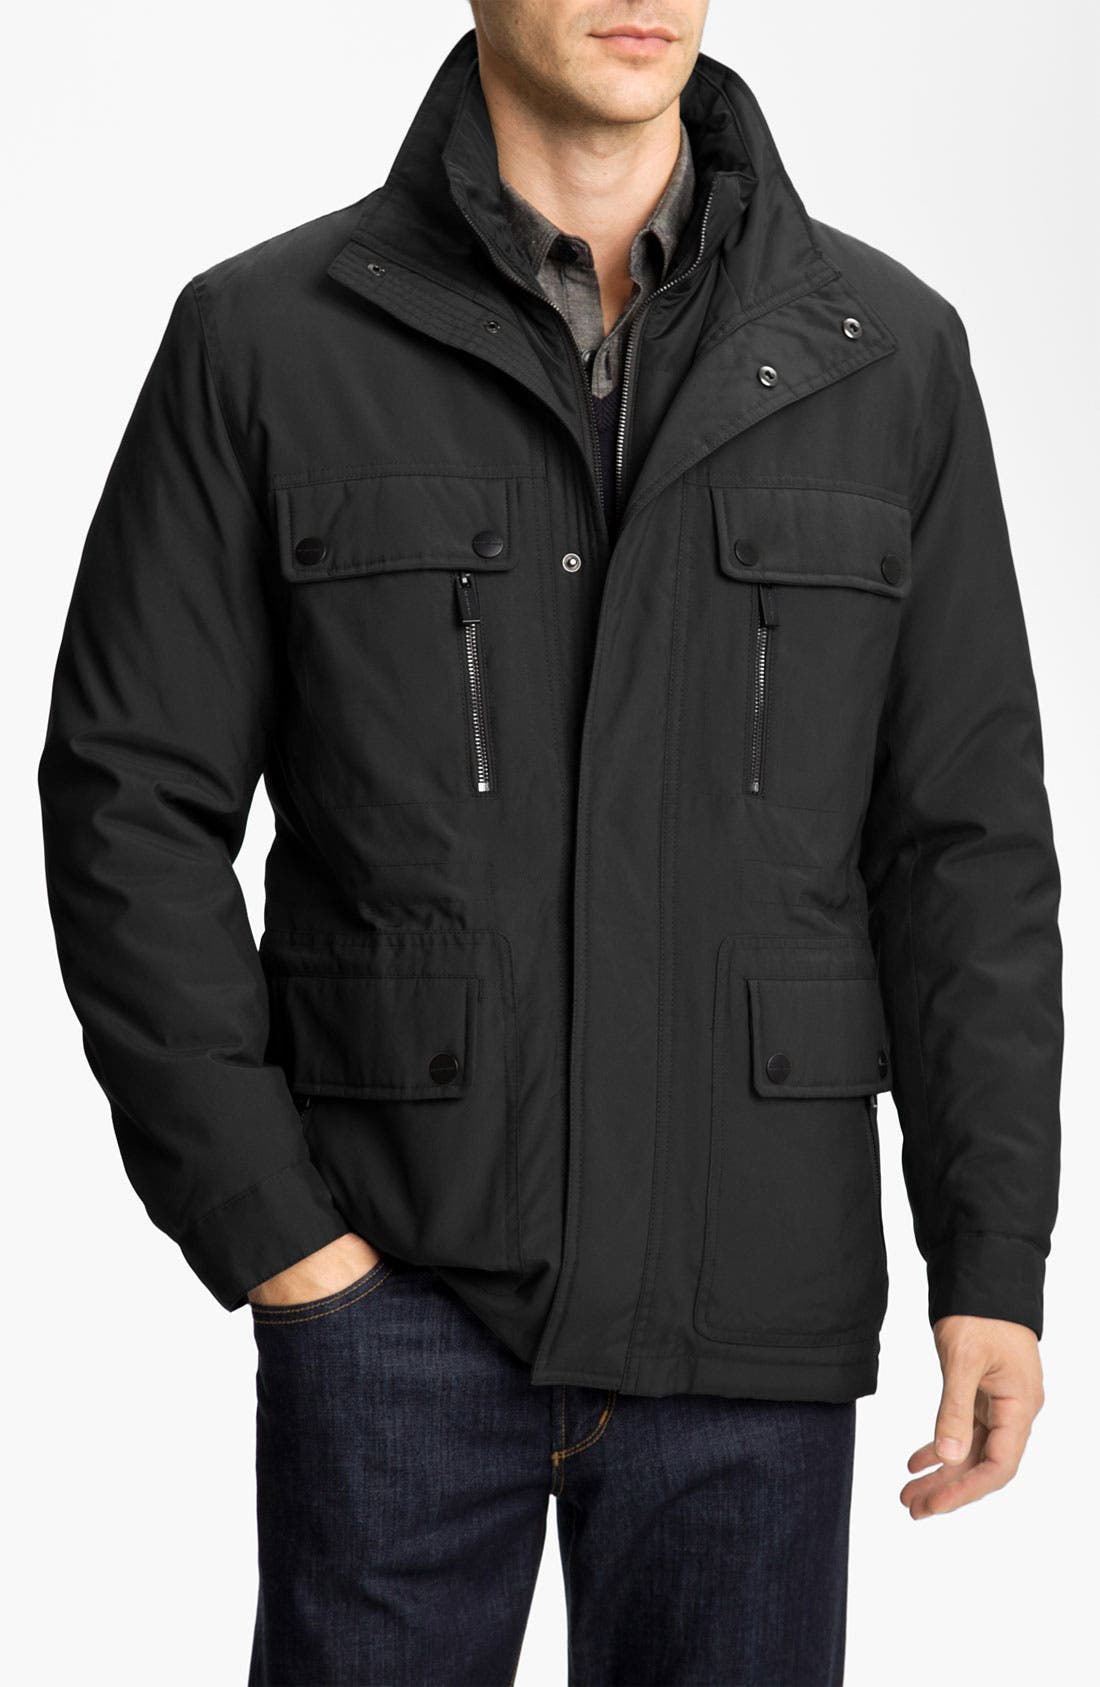 Main Image - Michael Kors 'Colfax' Jacket